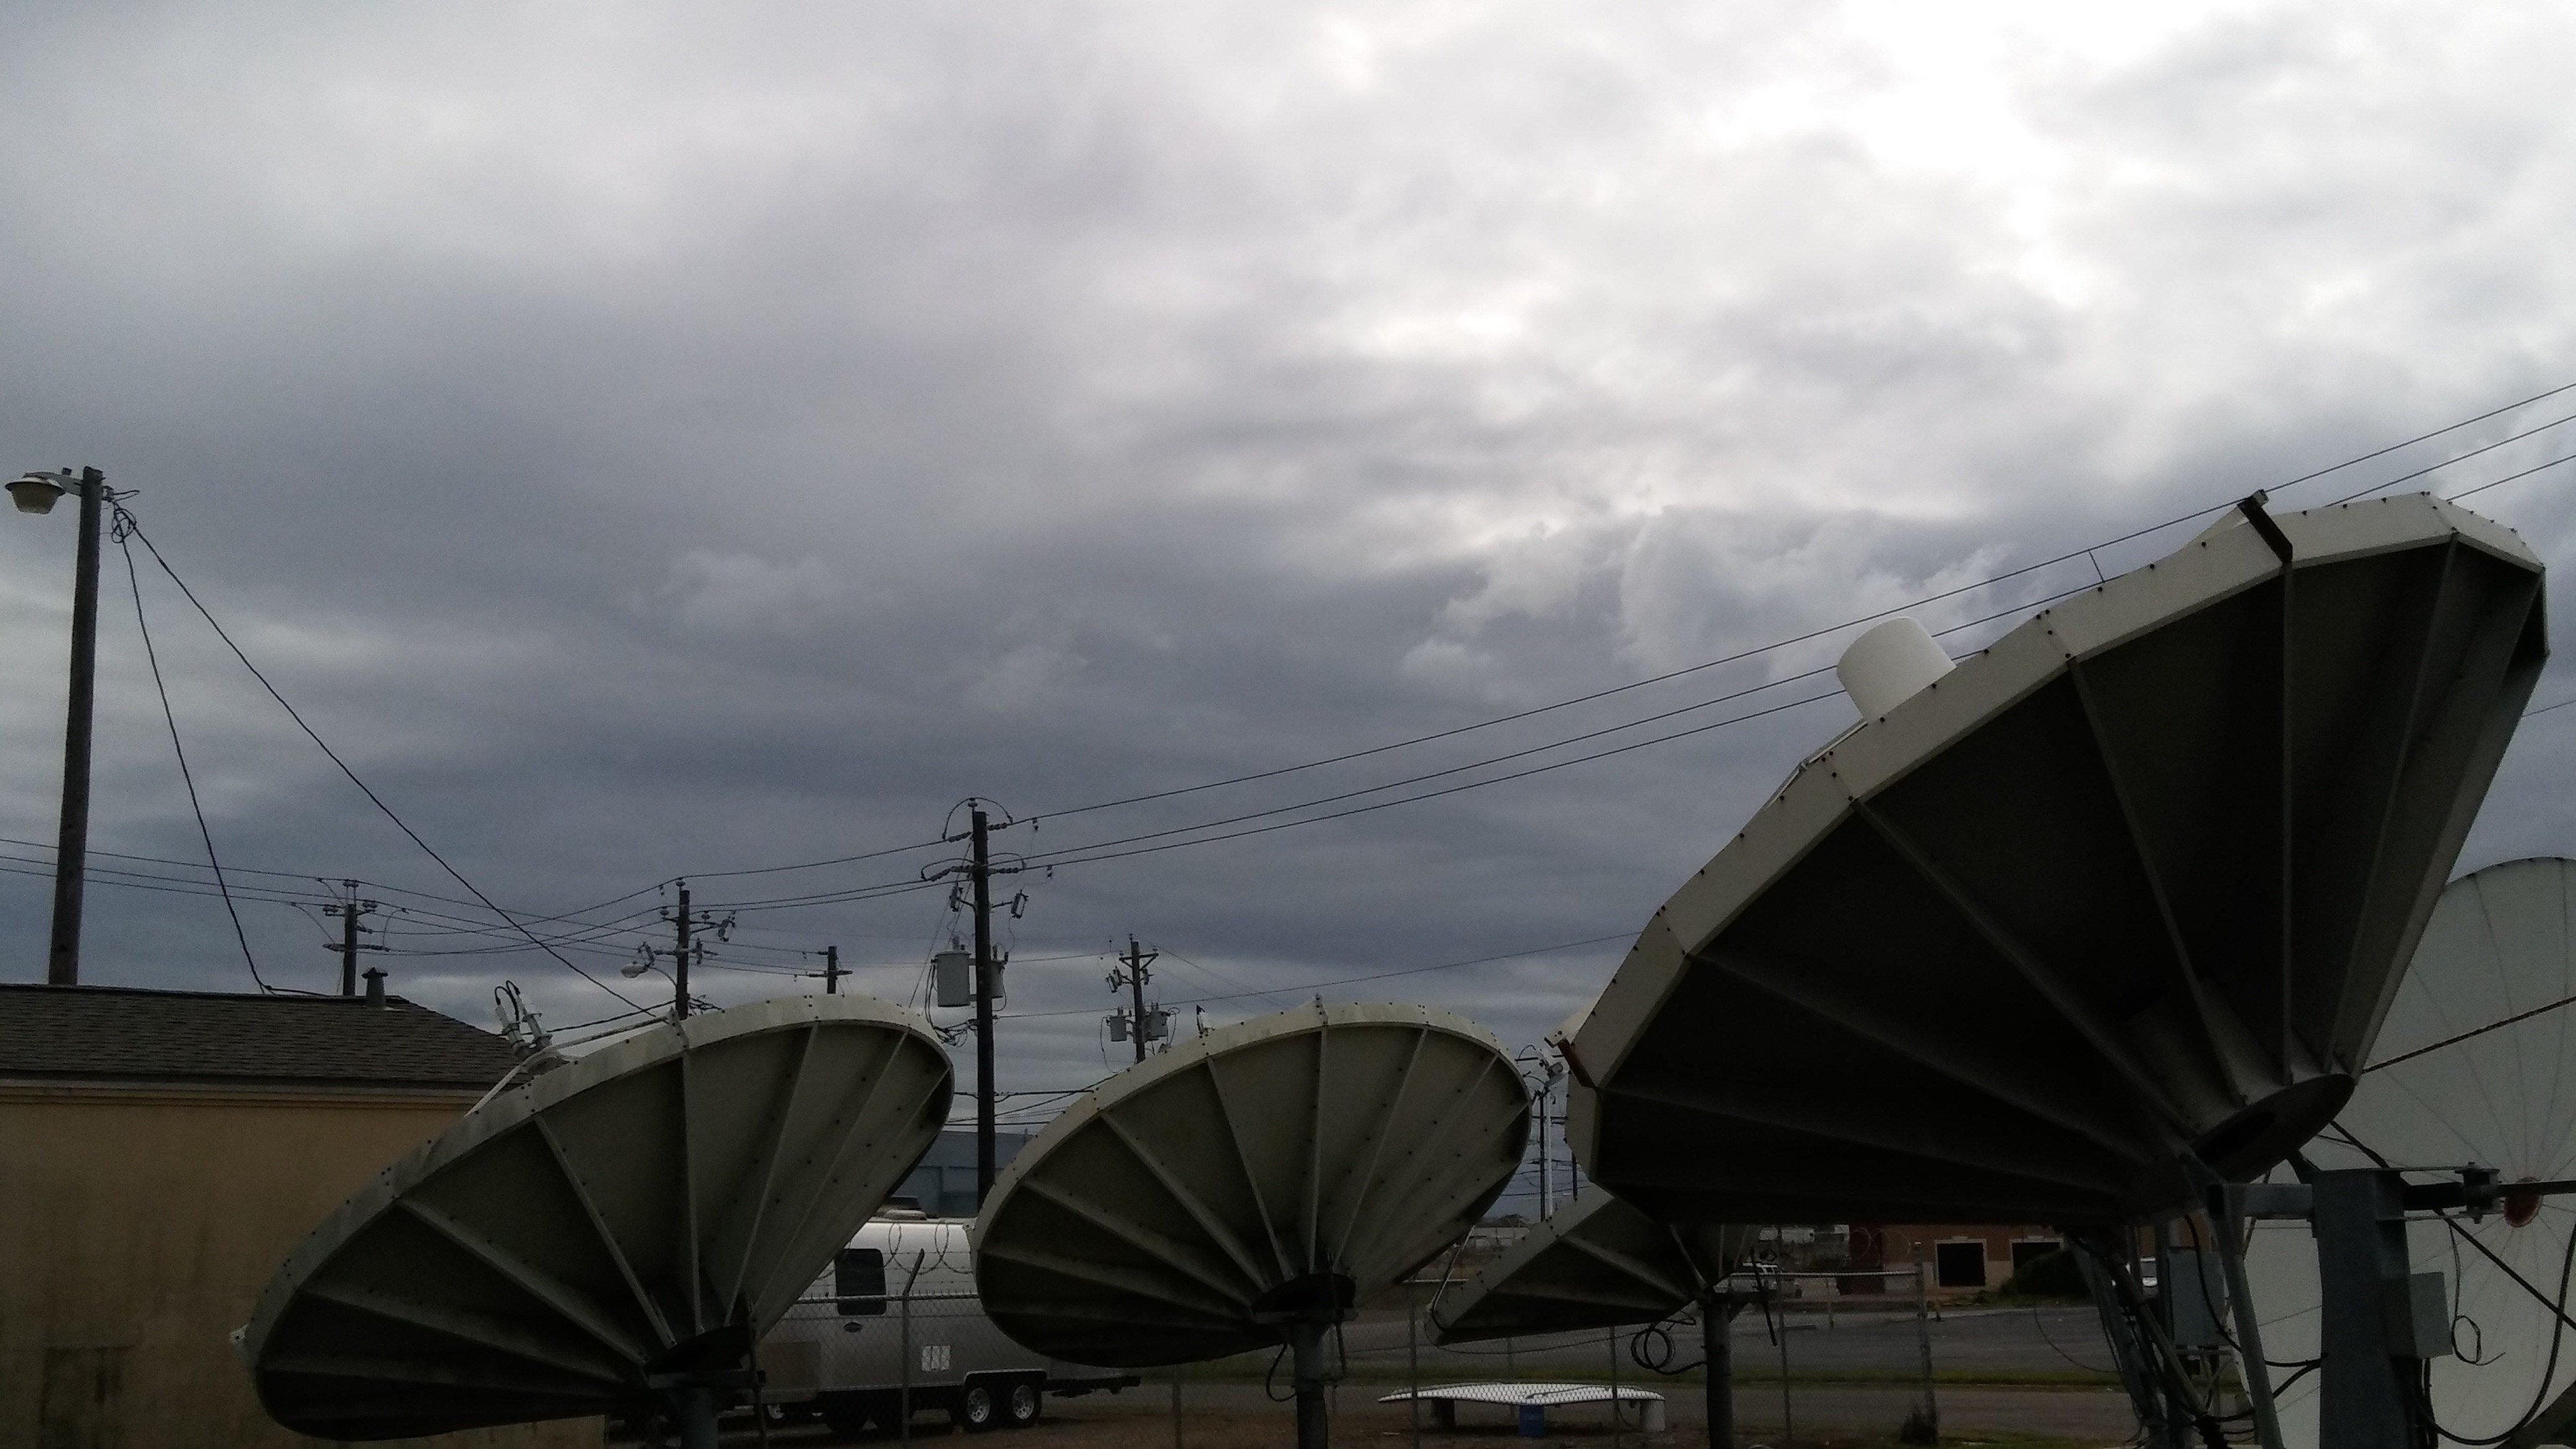 FIRST ALERT FORECAST: Few showers Saturday, heavy rain Sunday